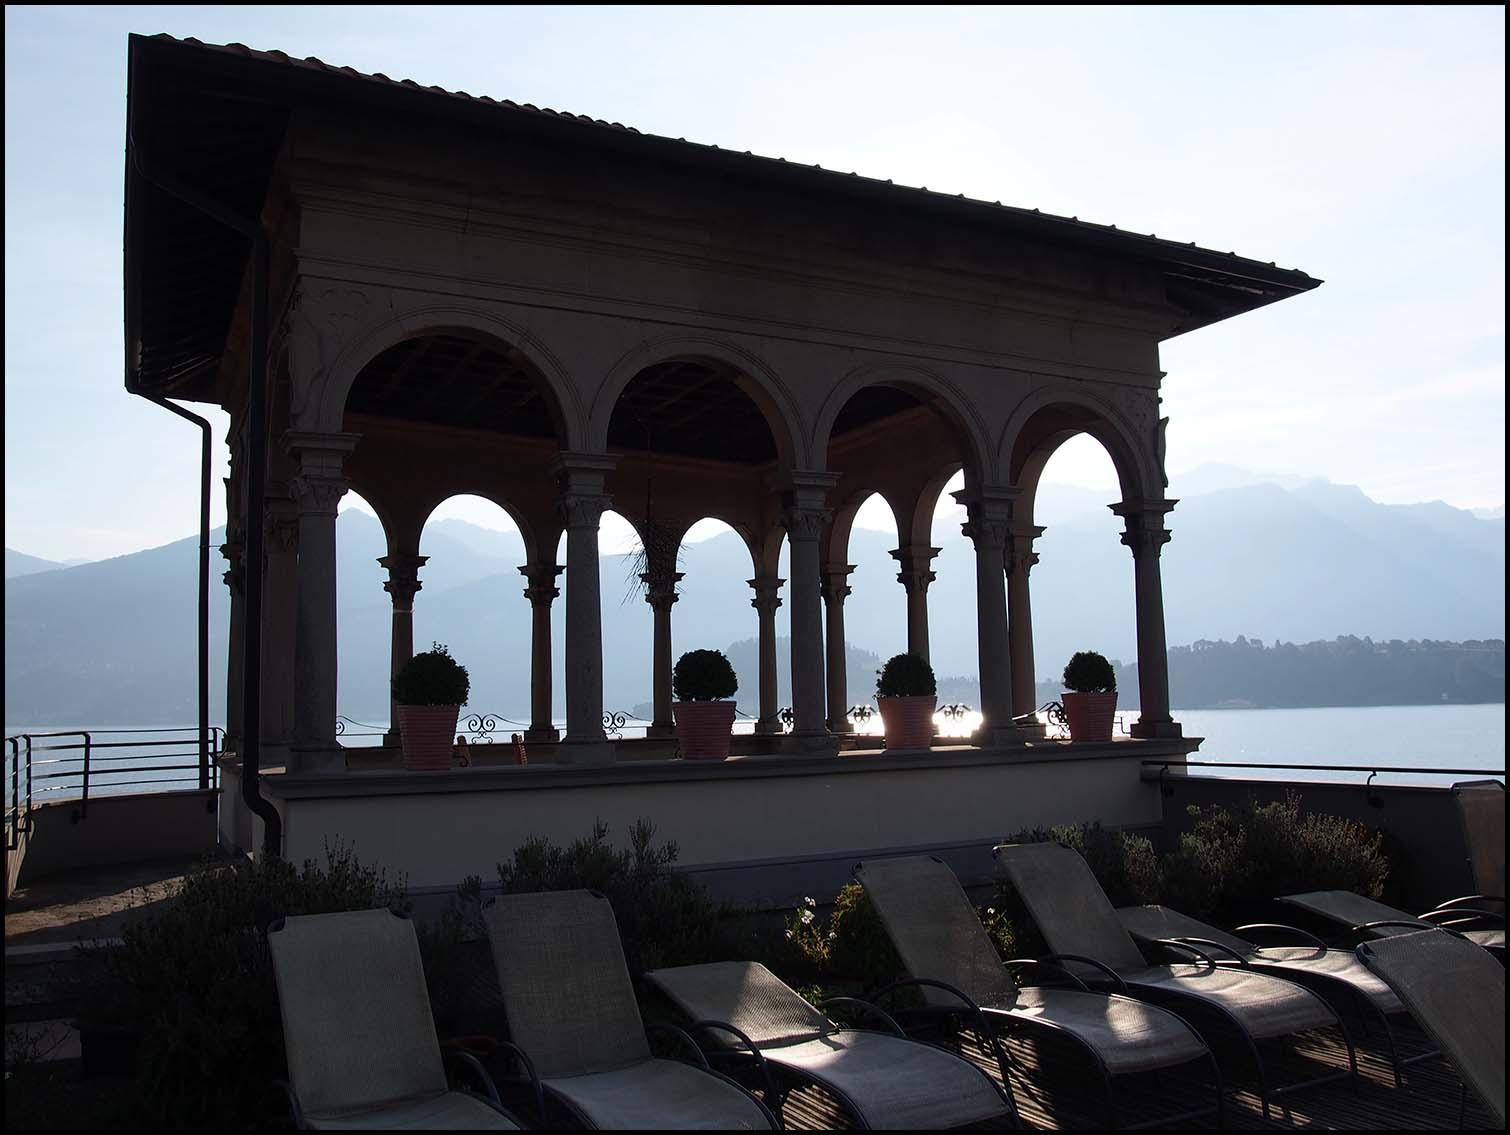 Grand Hotel Cadenabbia, sun terrace